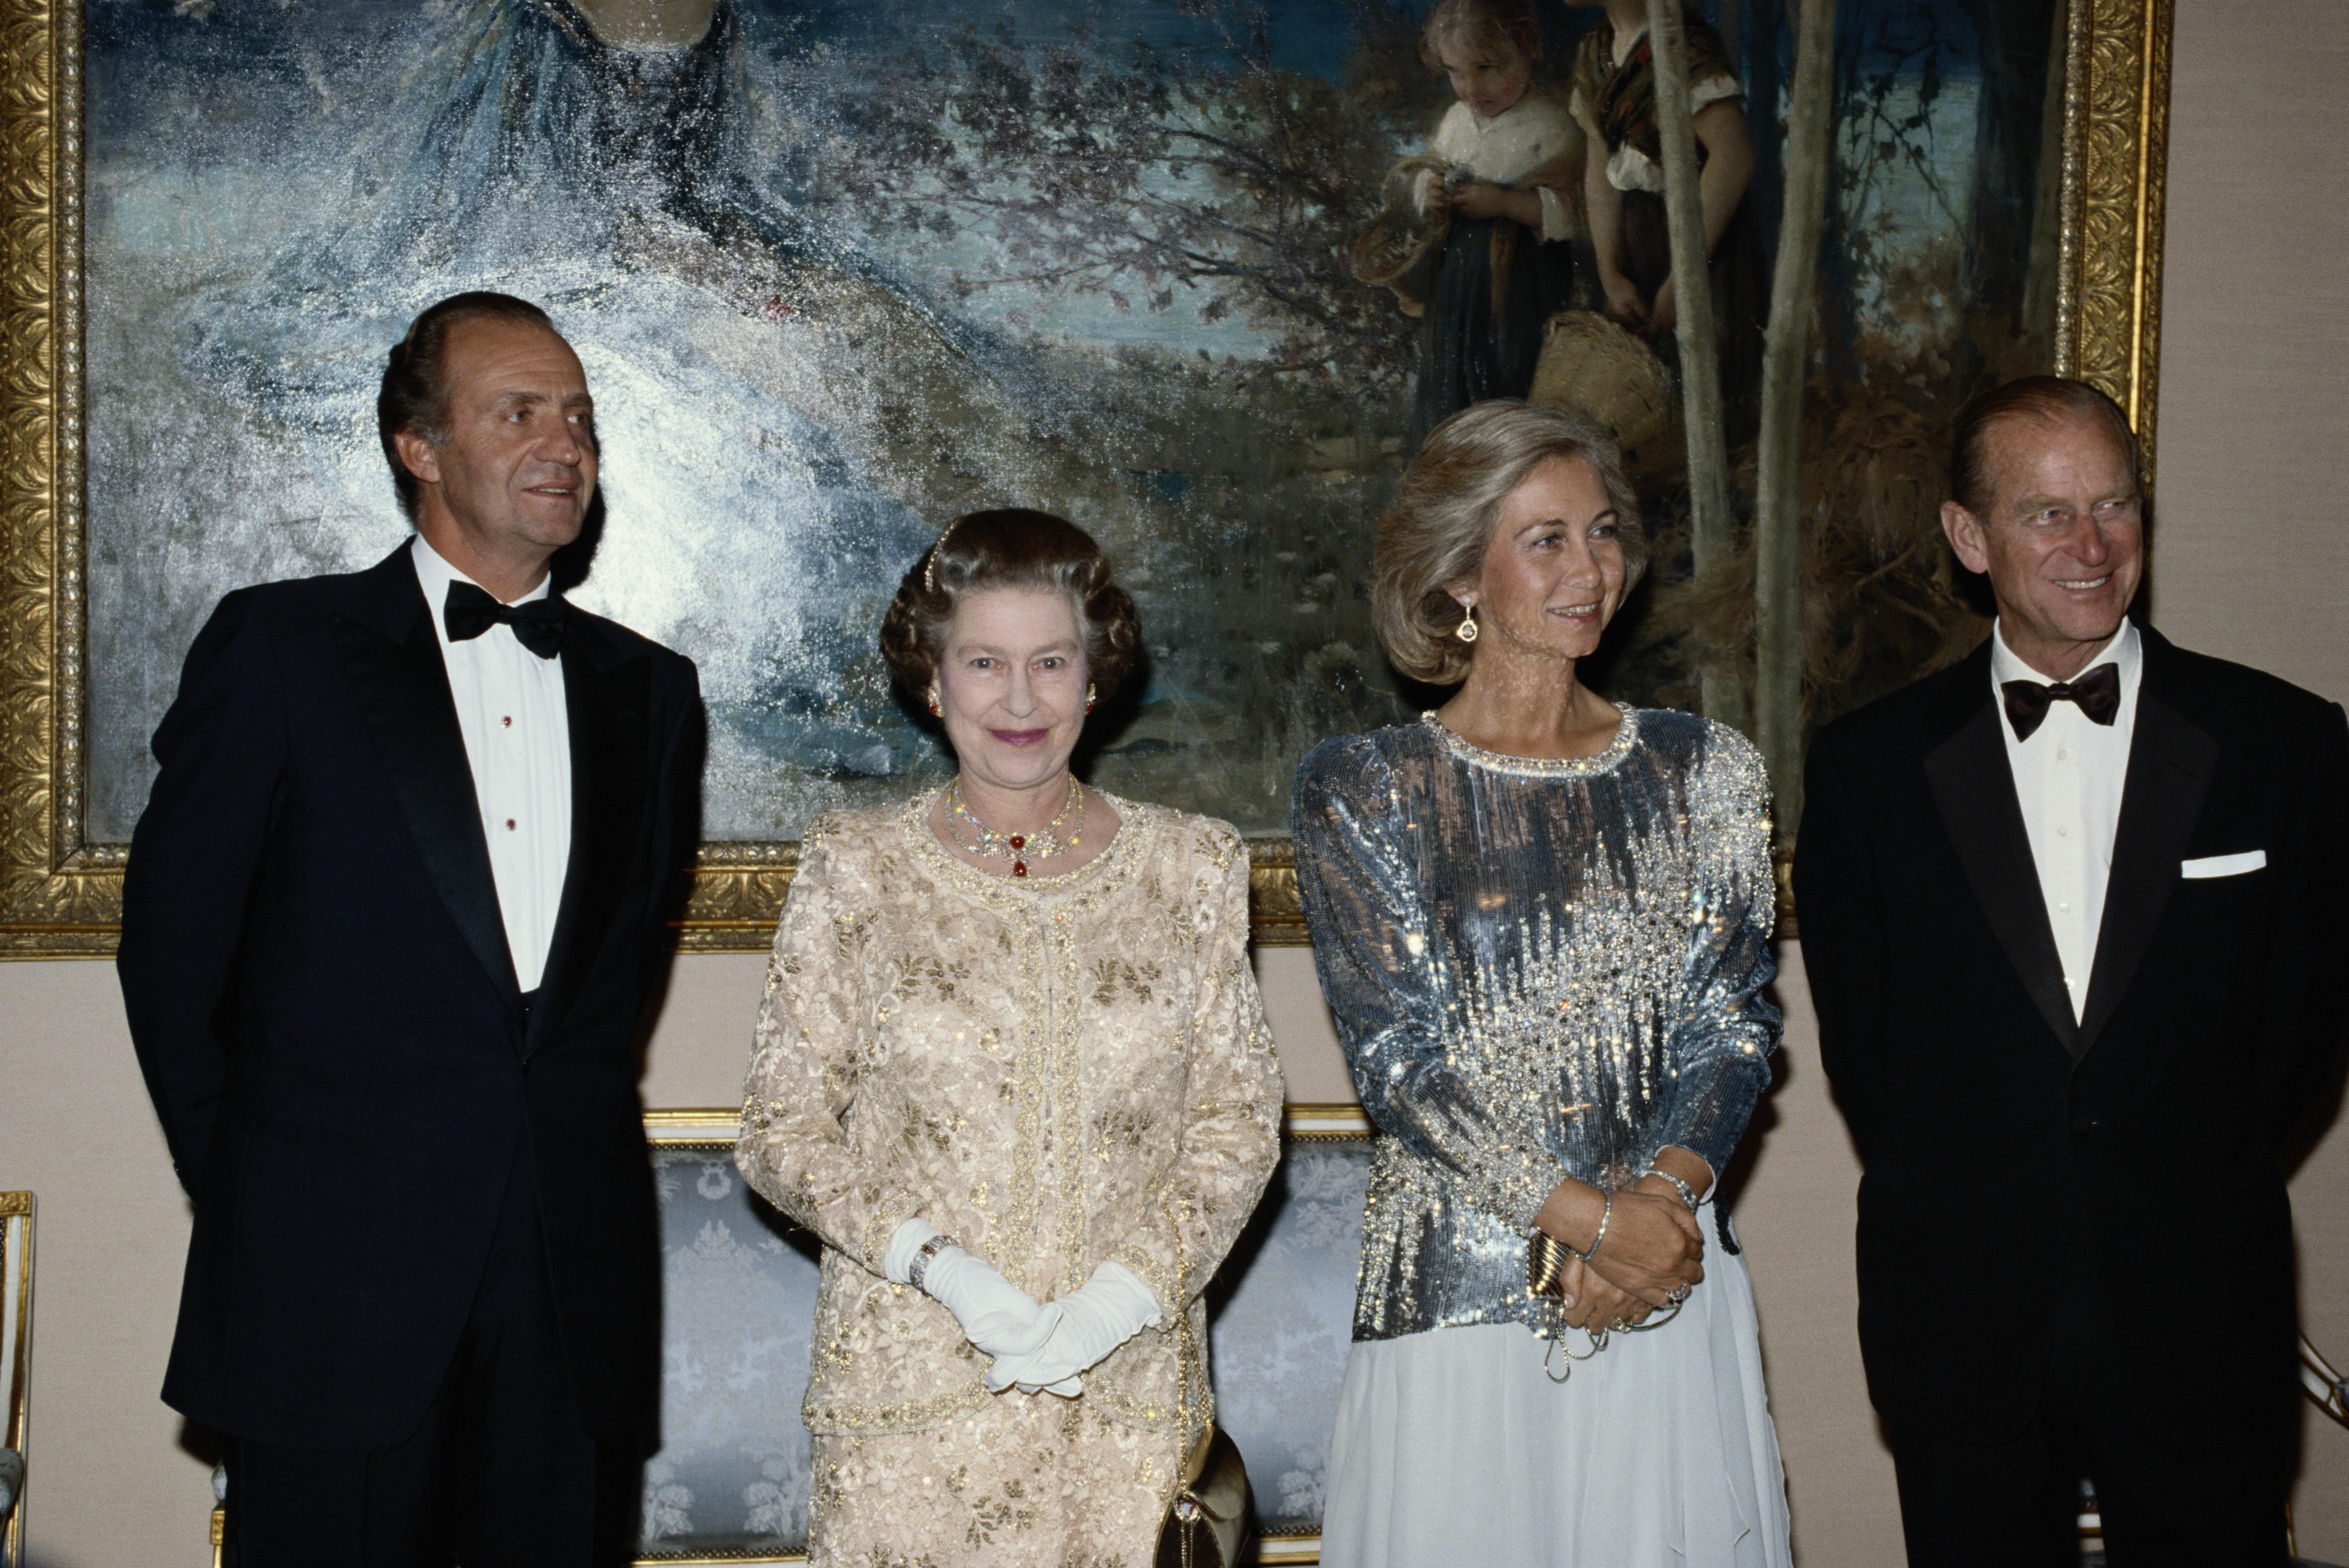 Prince Philip Sister Sophie